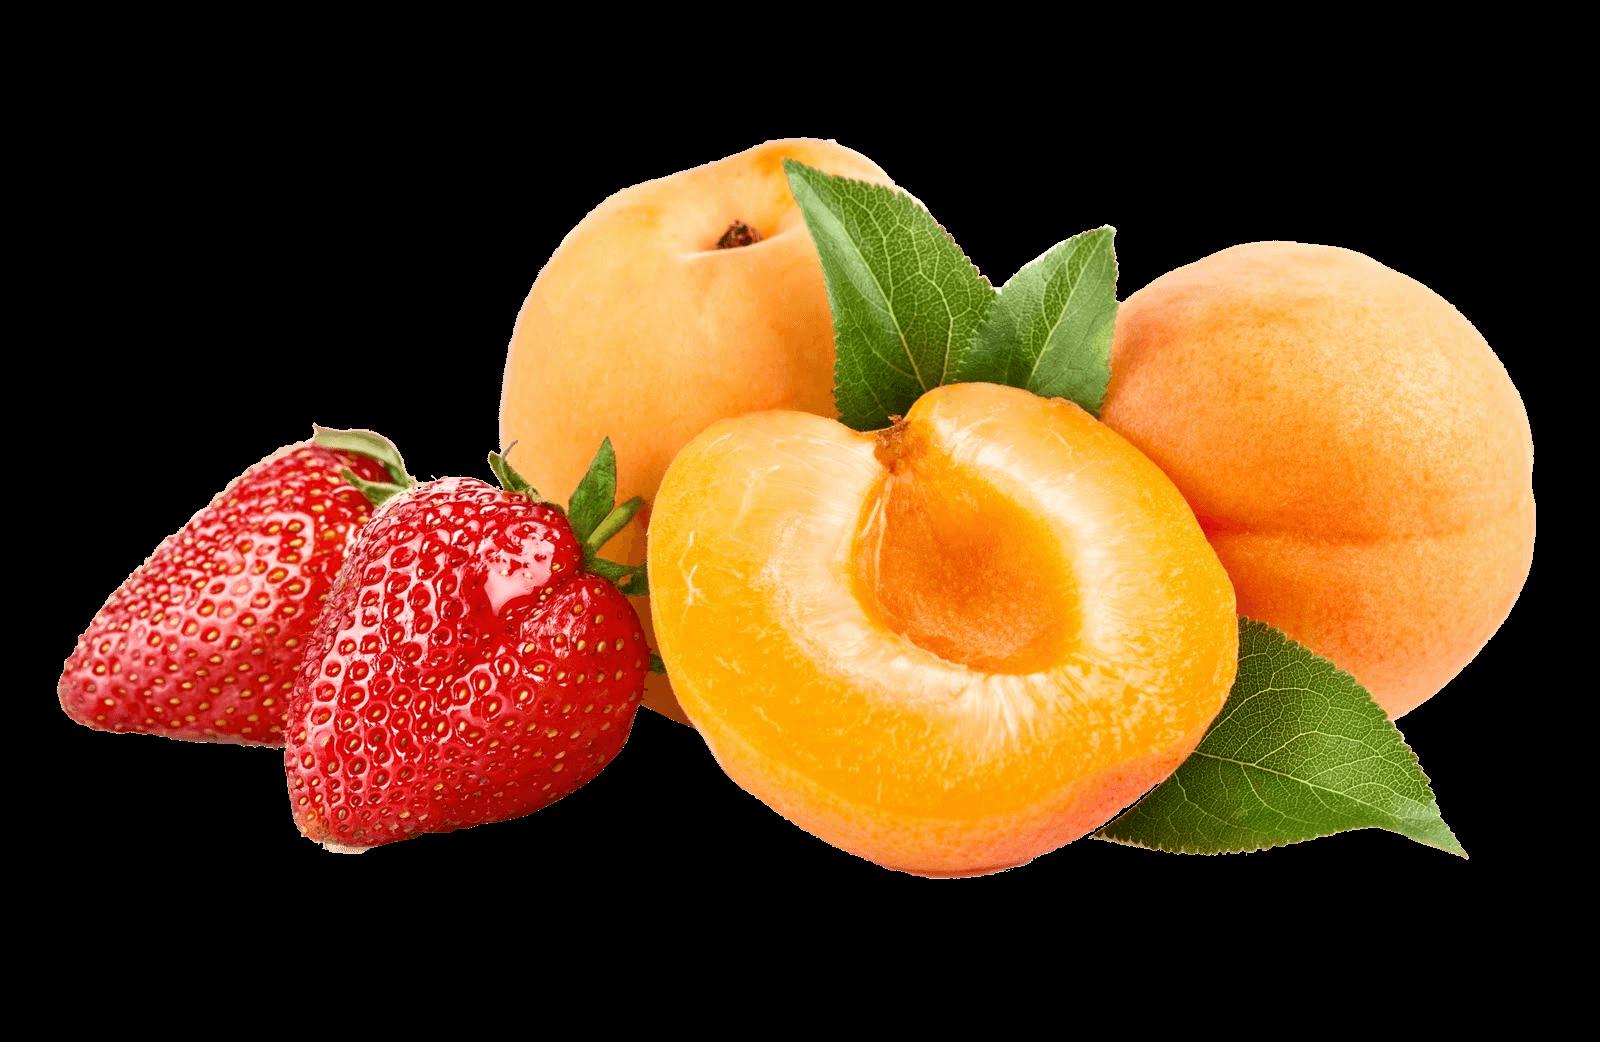 Strawberries clipart orange. Fruit peaches transparent png